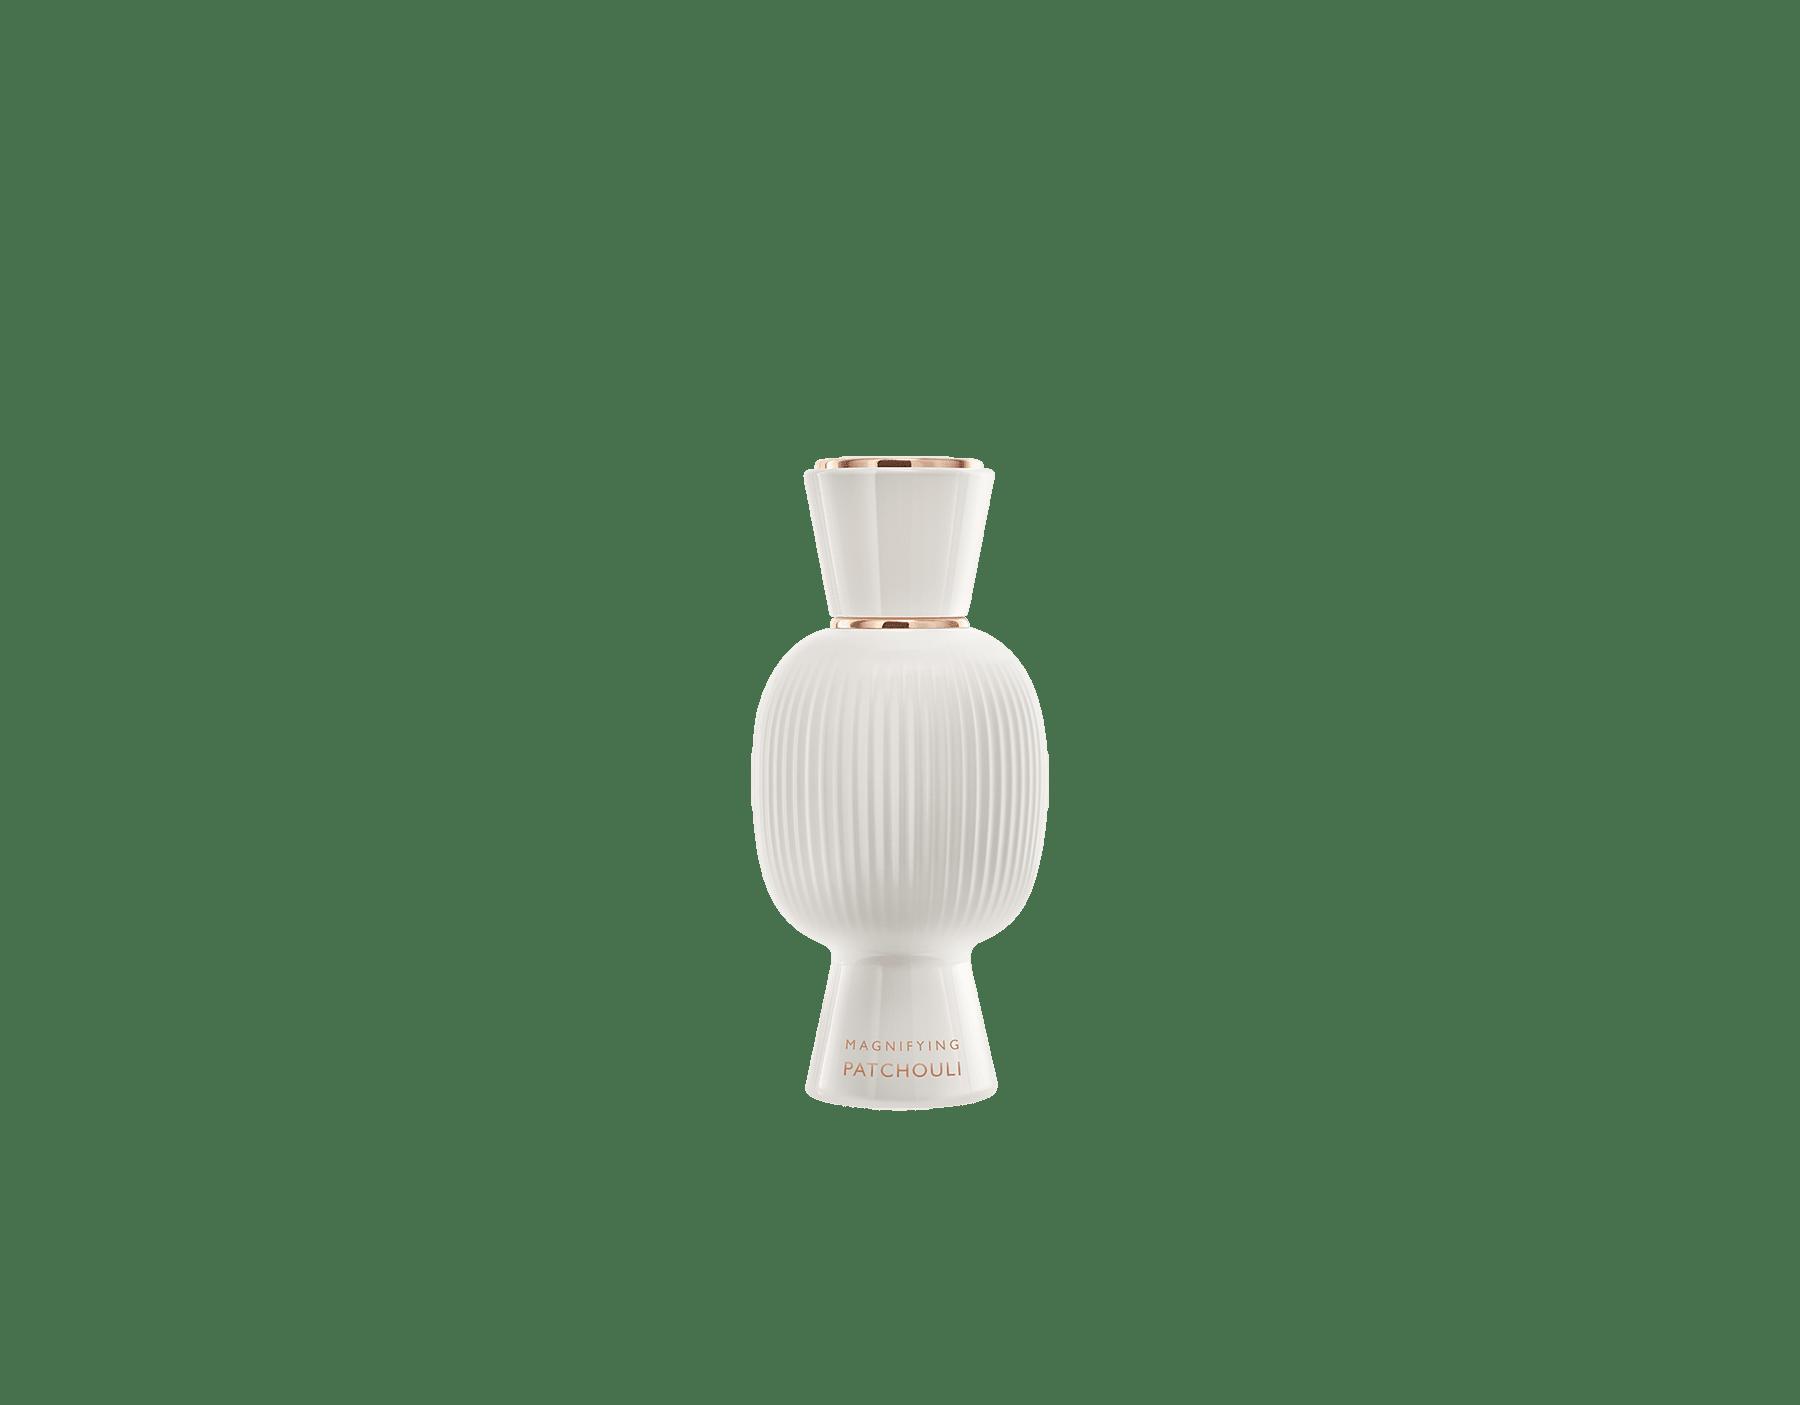 L'audace intensità di Magnifying Patchouli arricchisce la tua Eau de Parfum di seducenti note legnose. #MagnifyForMor Passion 41281 image 6